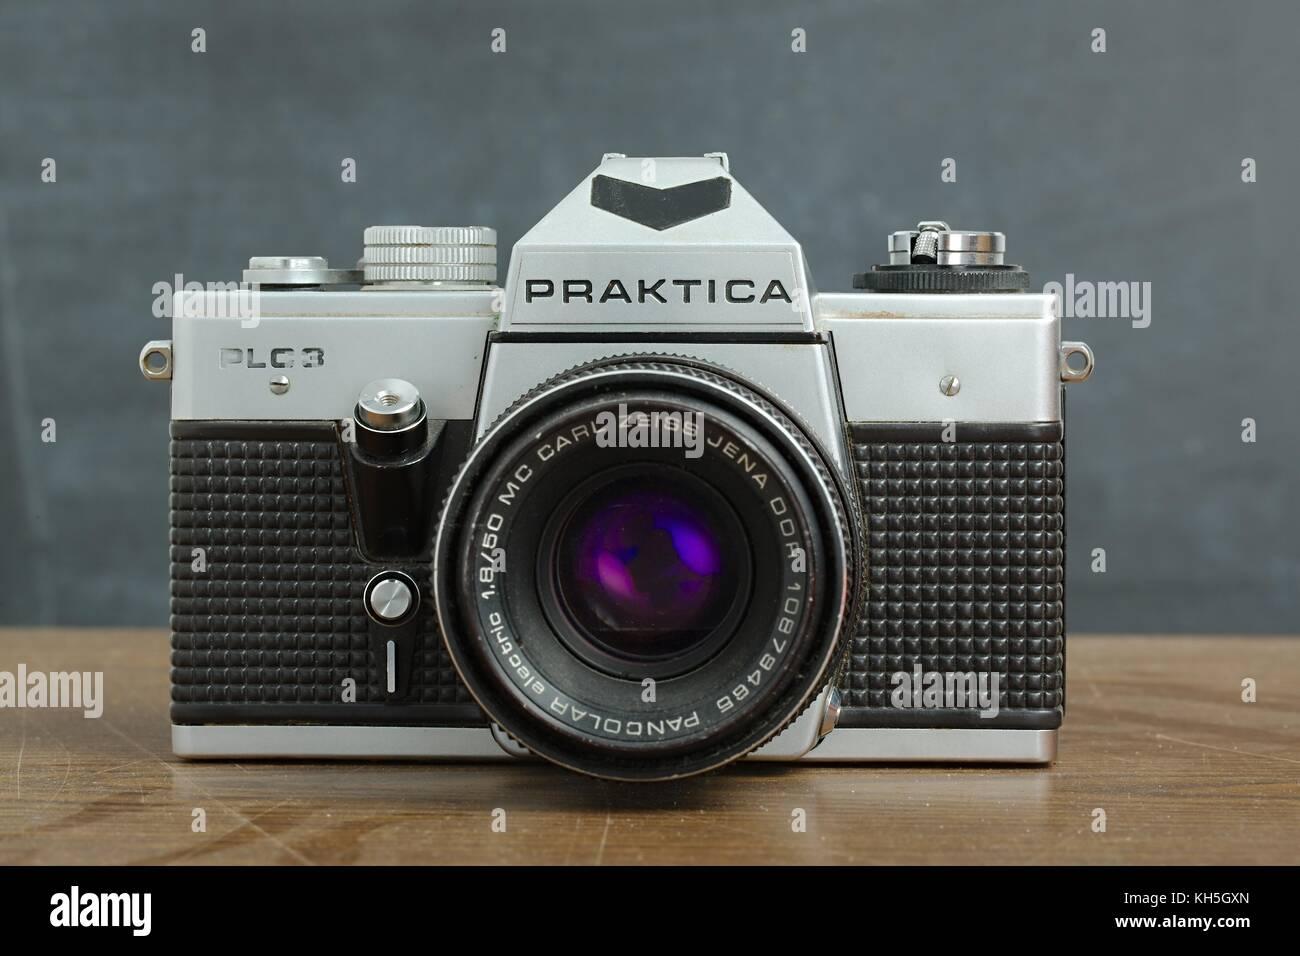 Vintage Praktica Camera - Stock Image